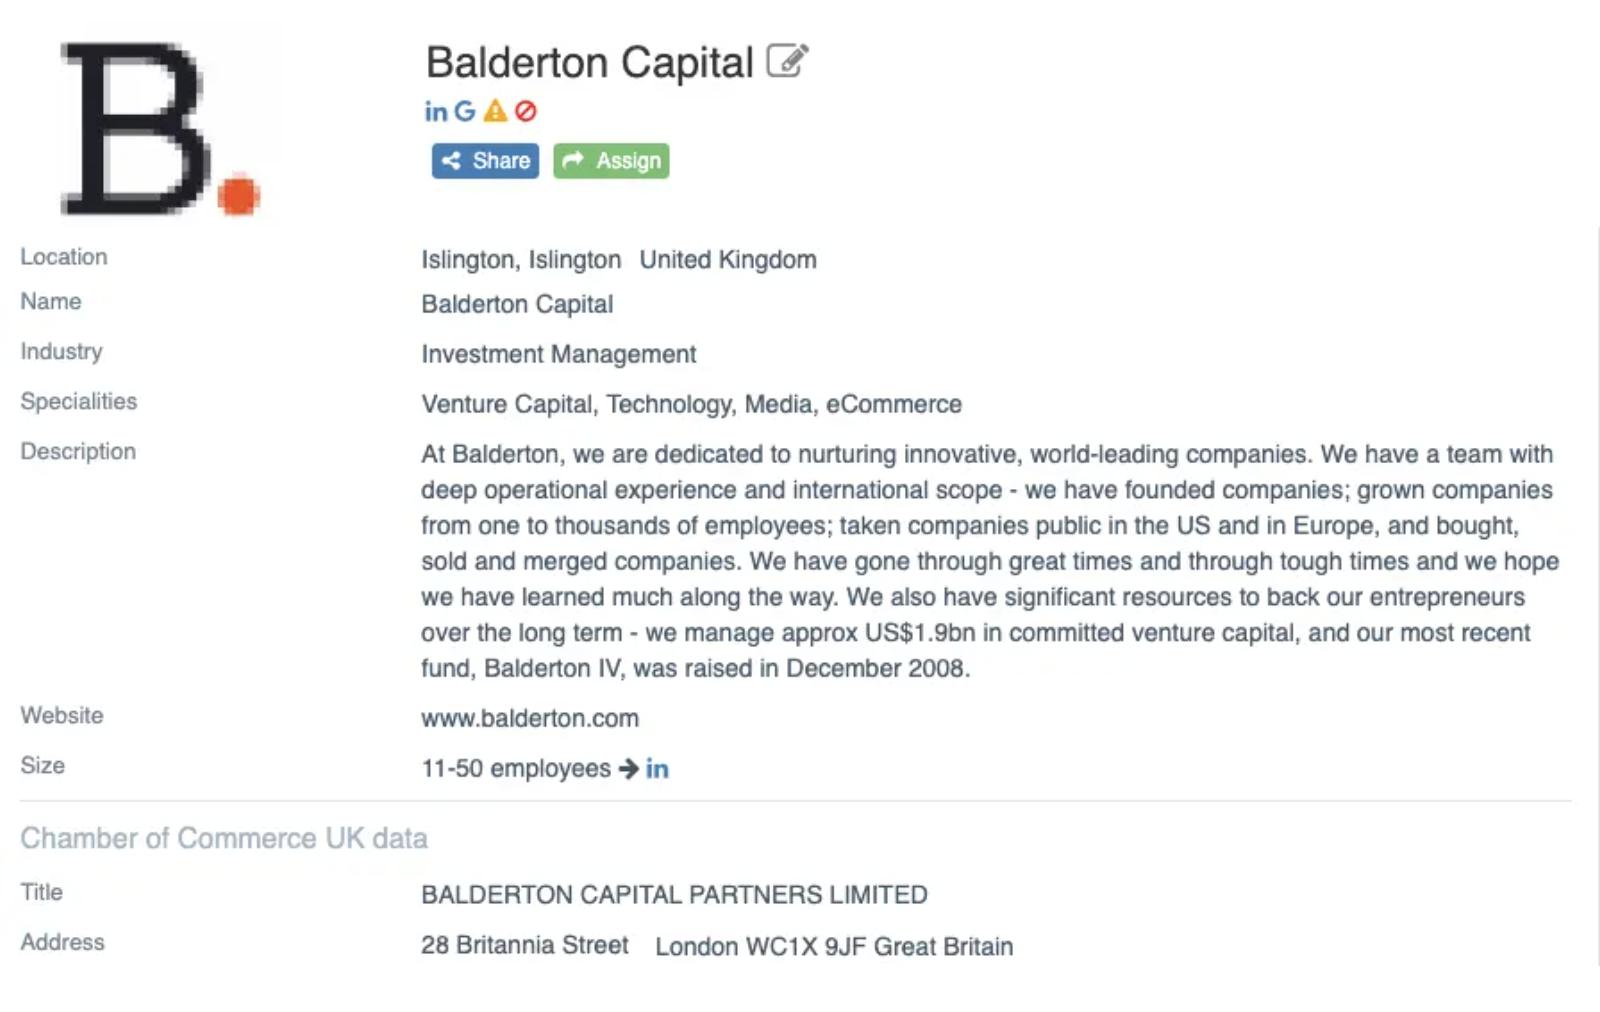 leadboxer-enriched-company-profile